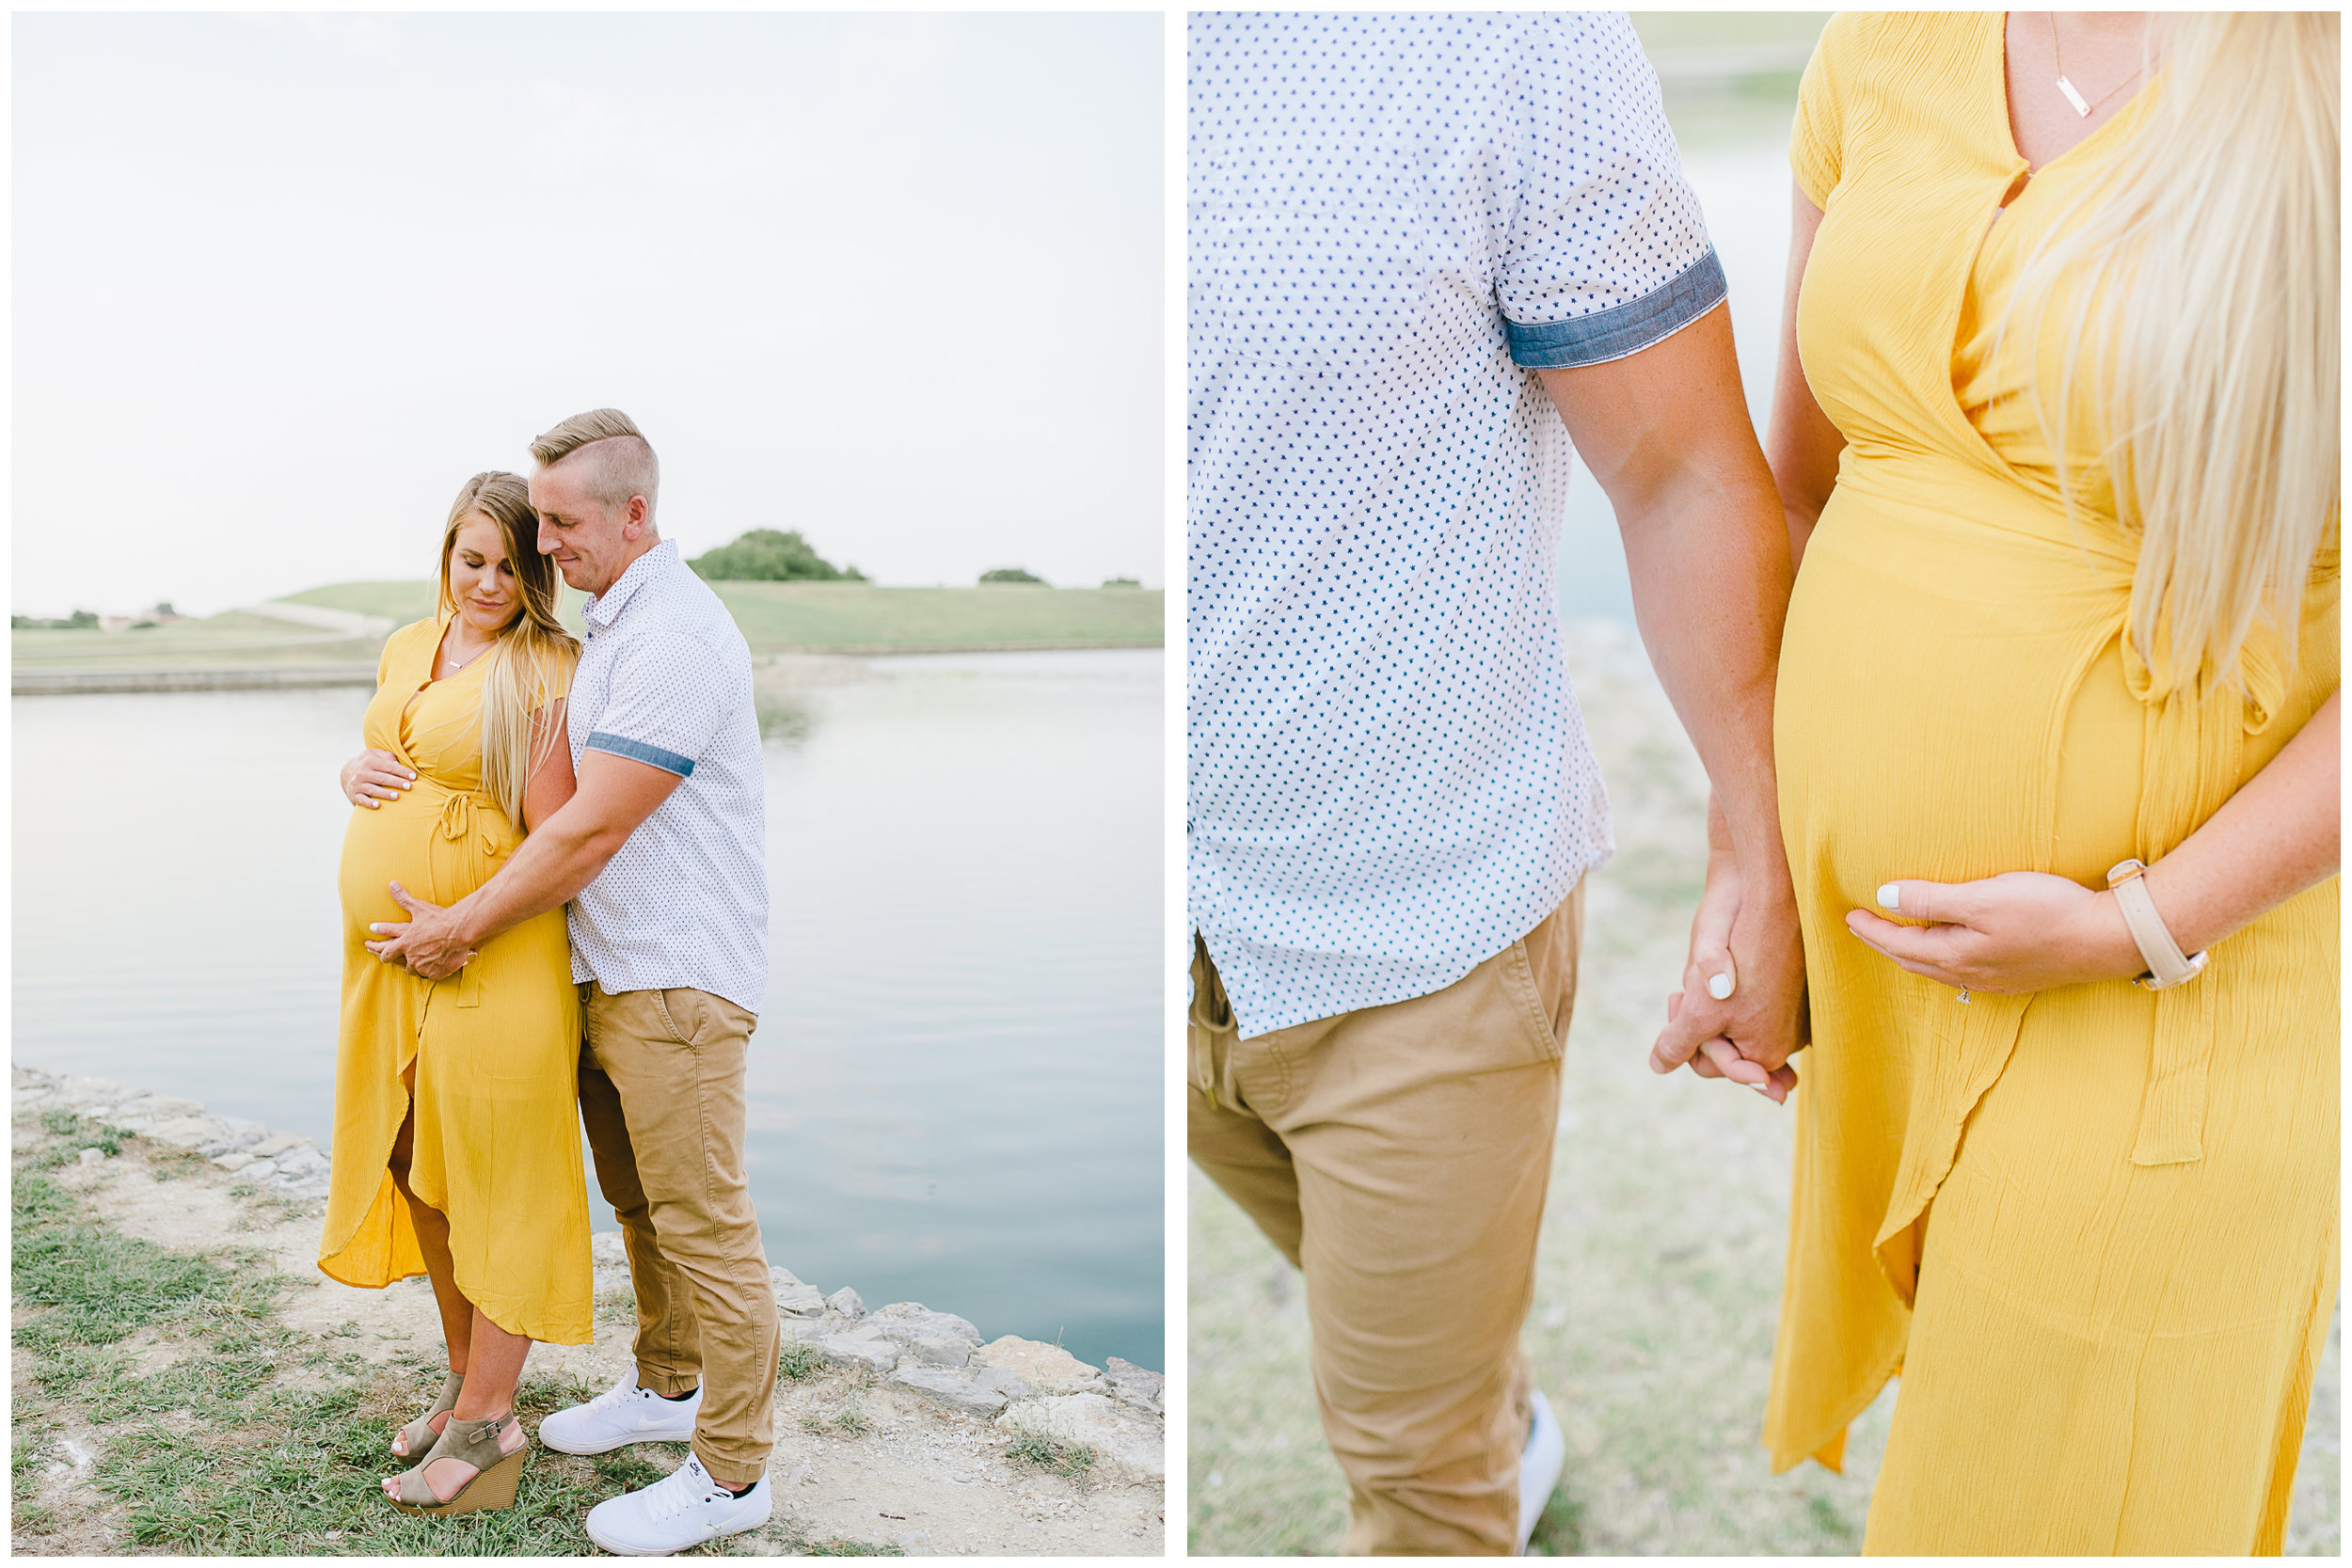 ashby maternity.jpg